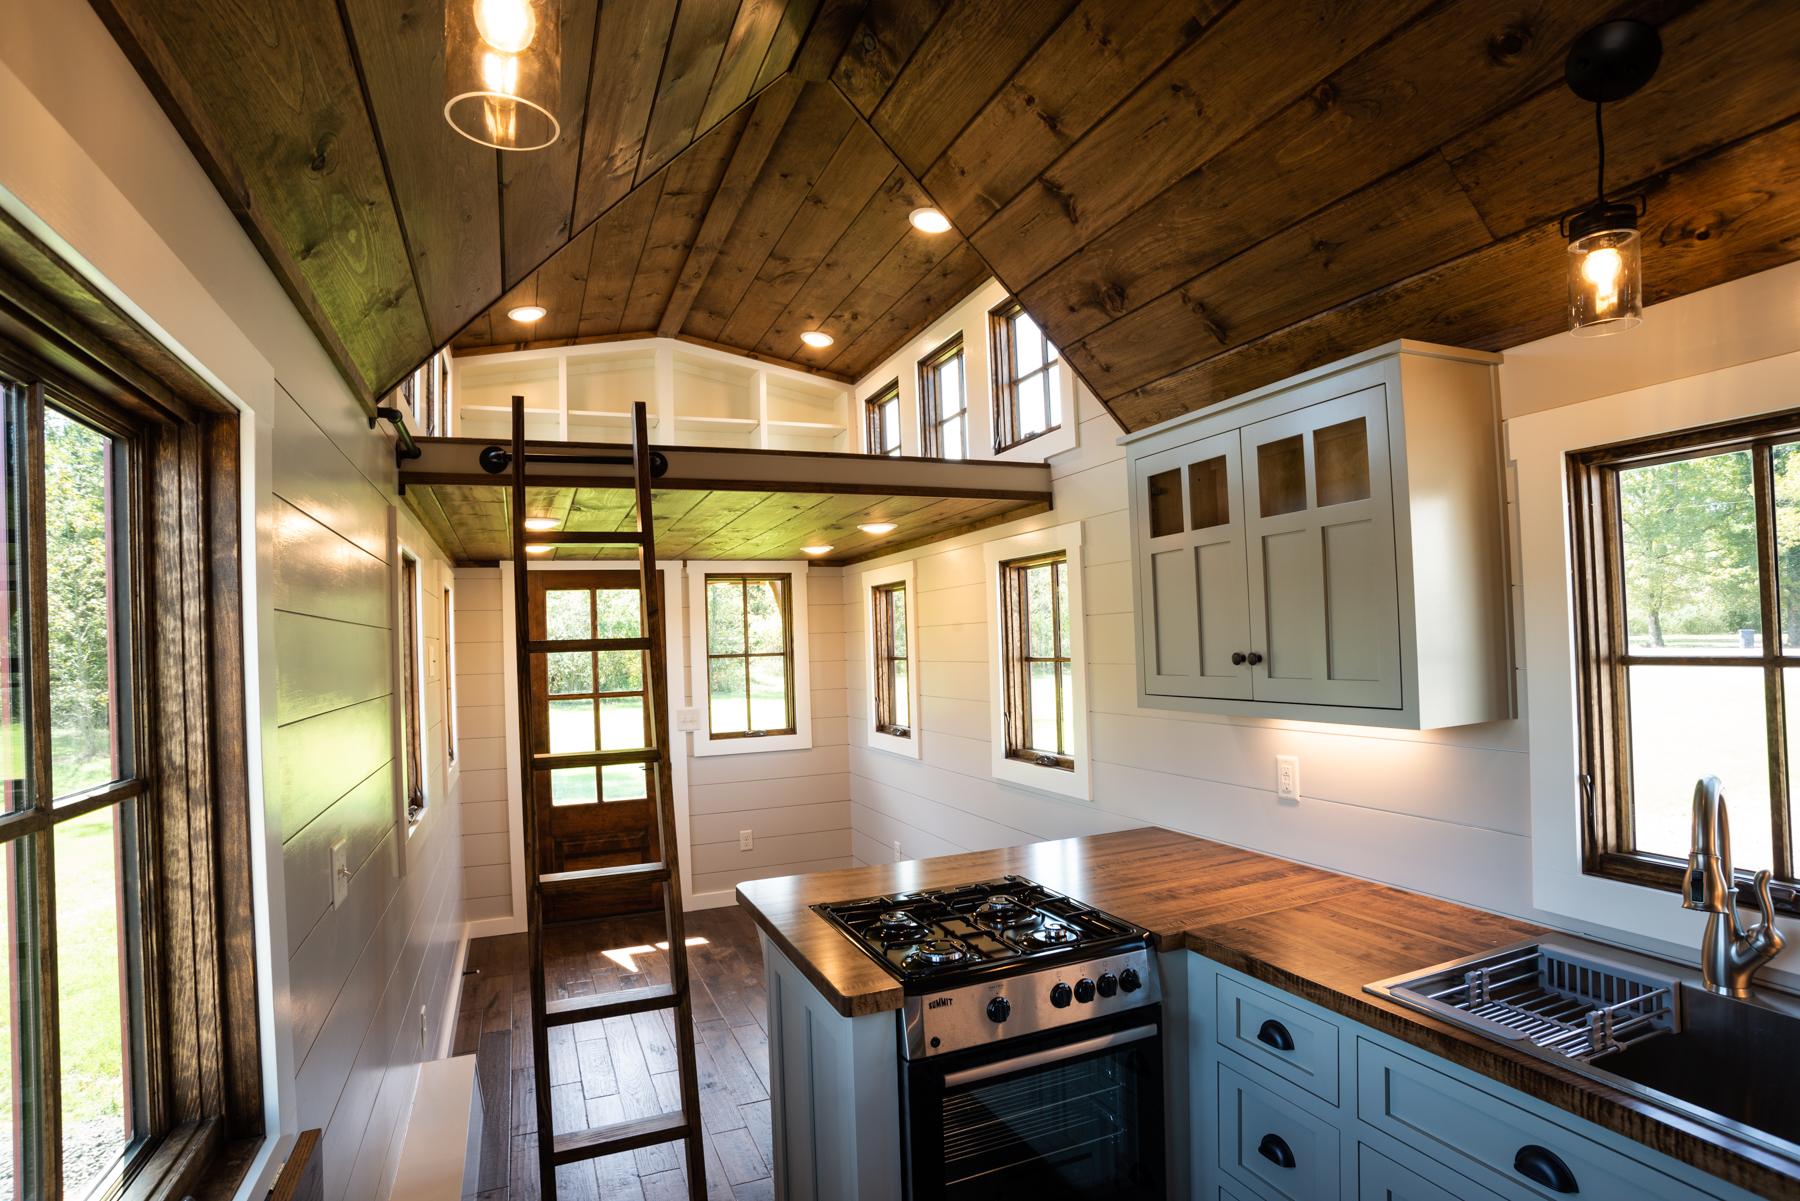 TImbercraft with loft